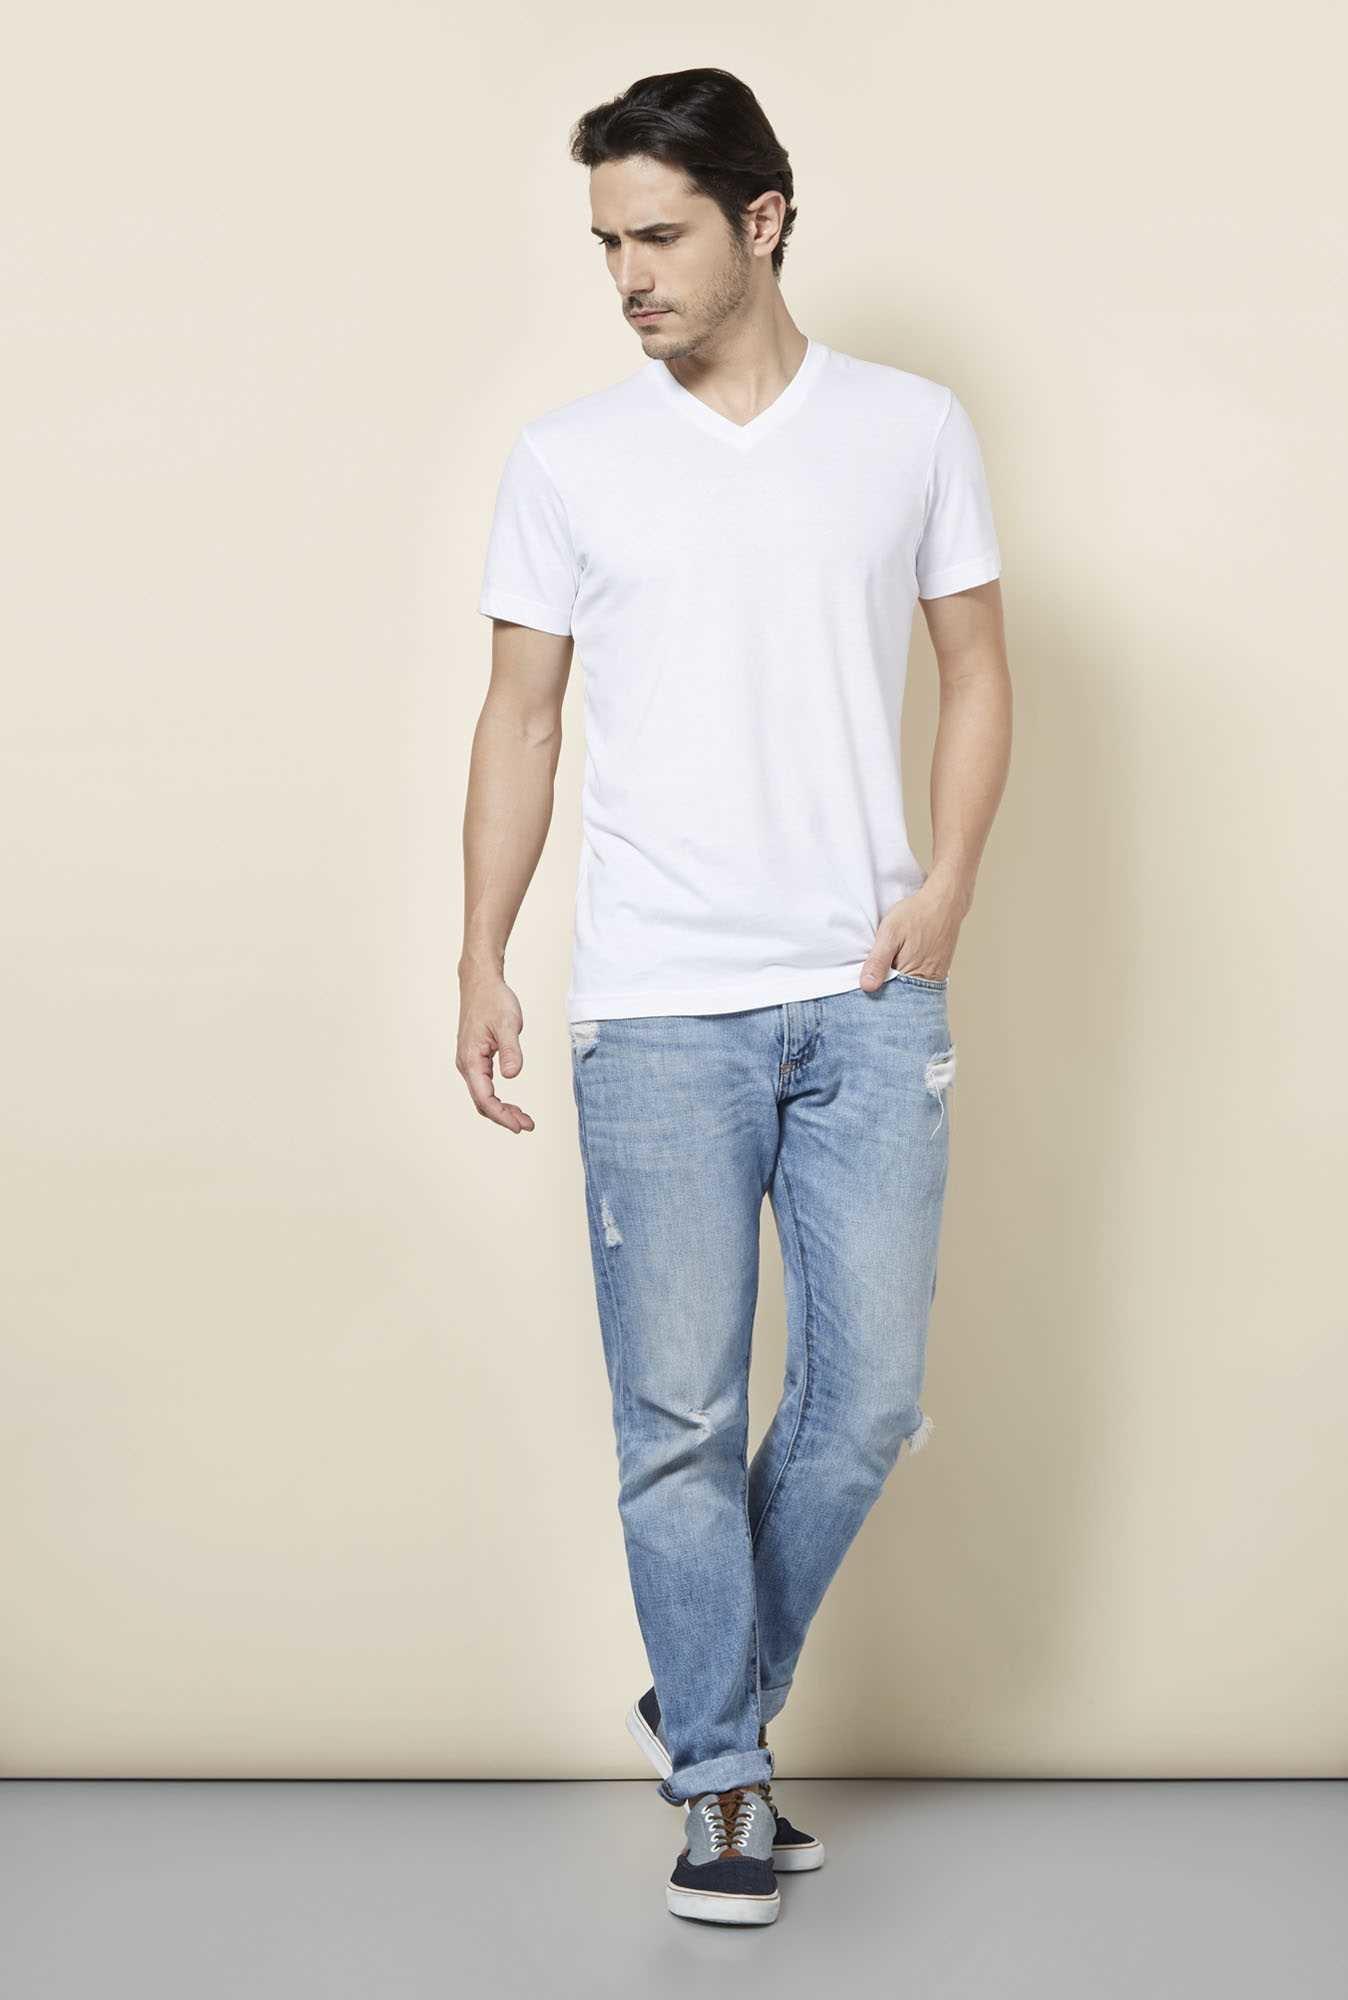 Buy tuna london white v neck t shirt online at best price for Best white v neck t shirt